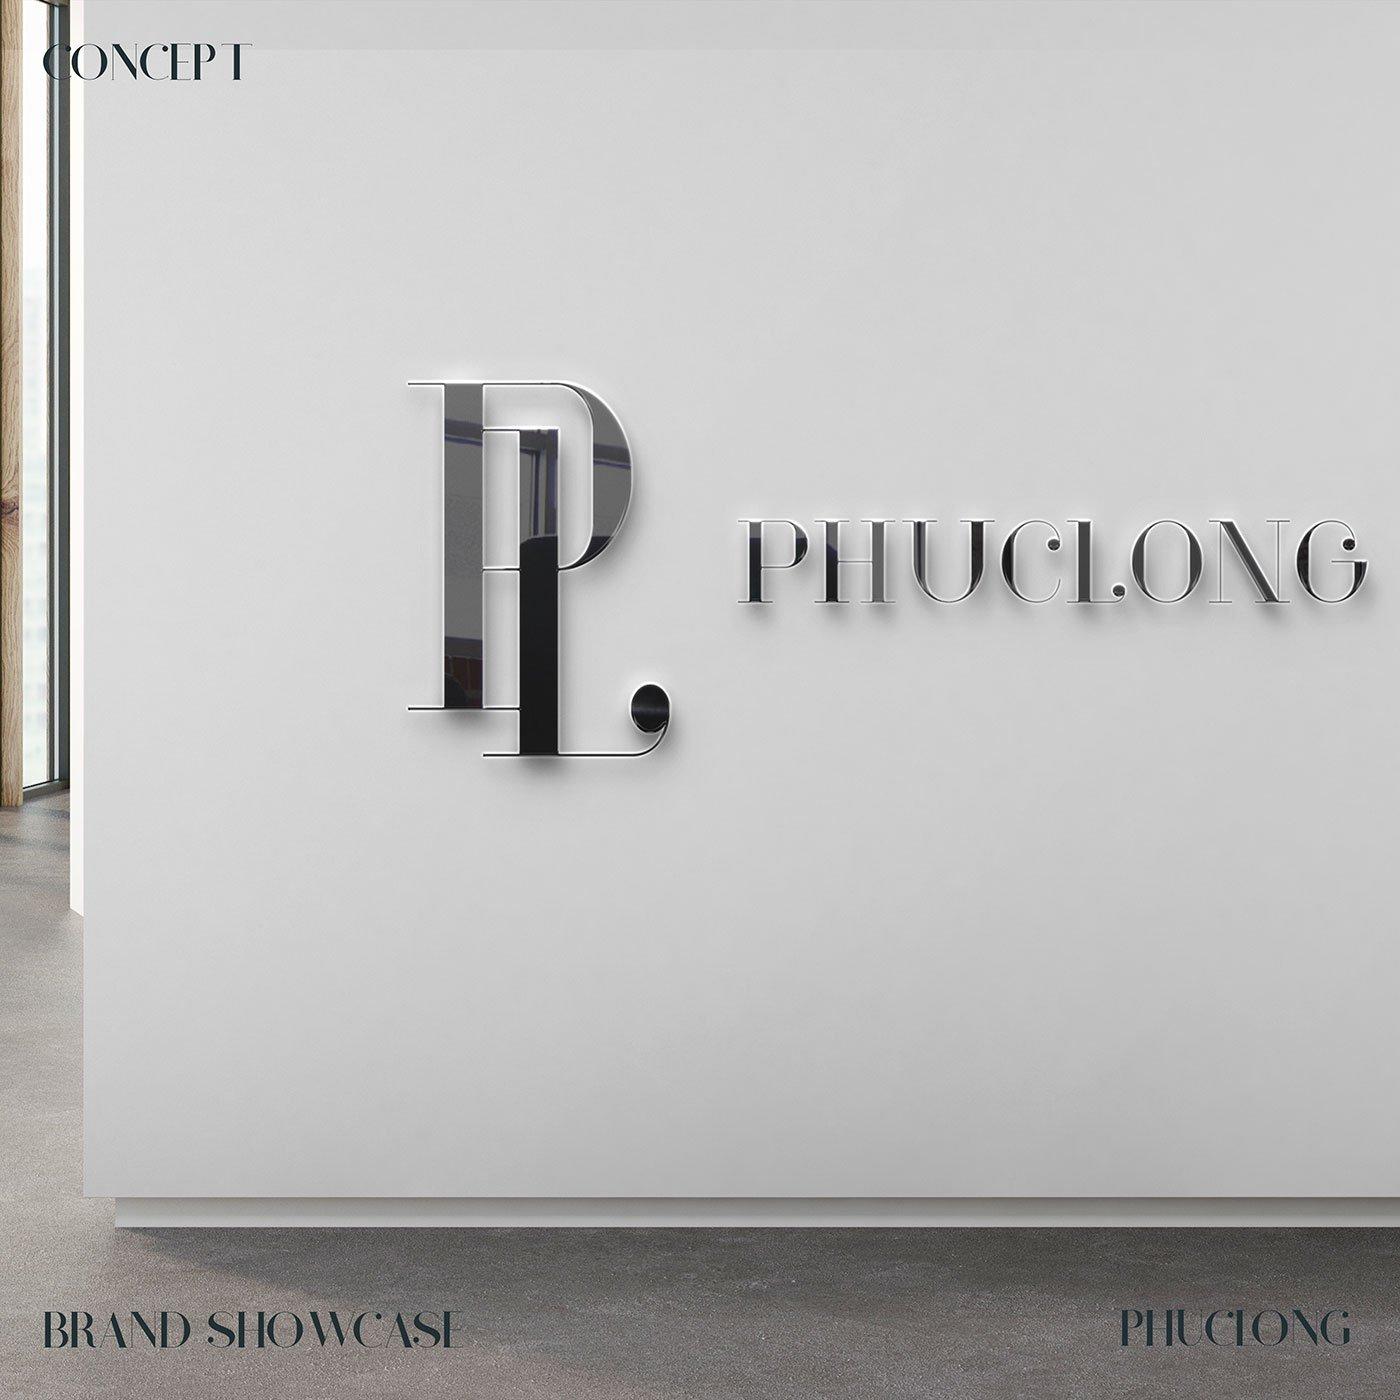 brand-logo-showcase-mockup-design-visual-identity-design-PhucLong-Vietnam-graphic-design-and-branding-web-design-professional-logo-design-company-logo-design-Helixgram